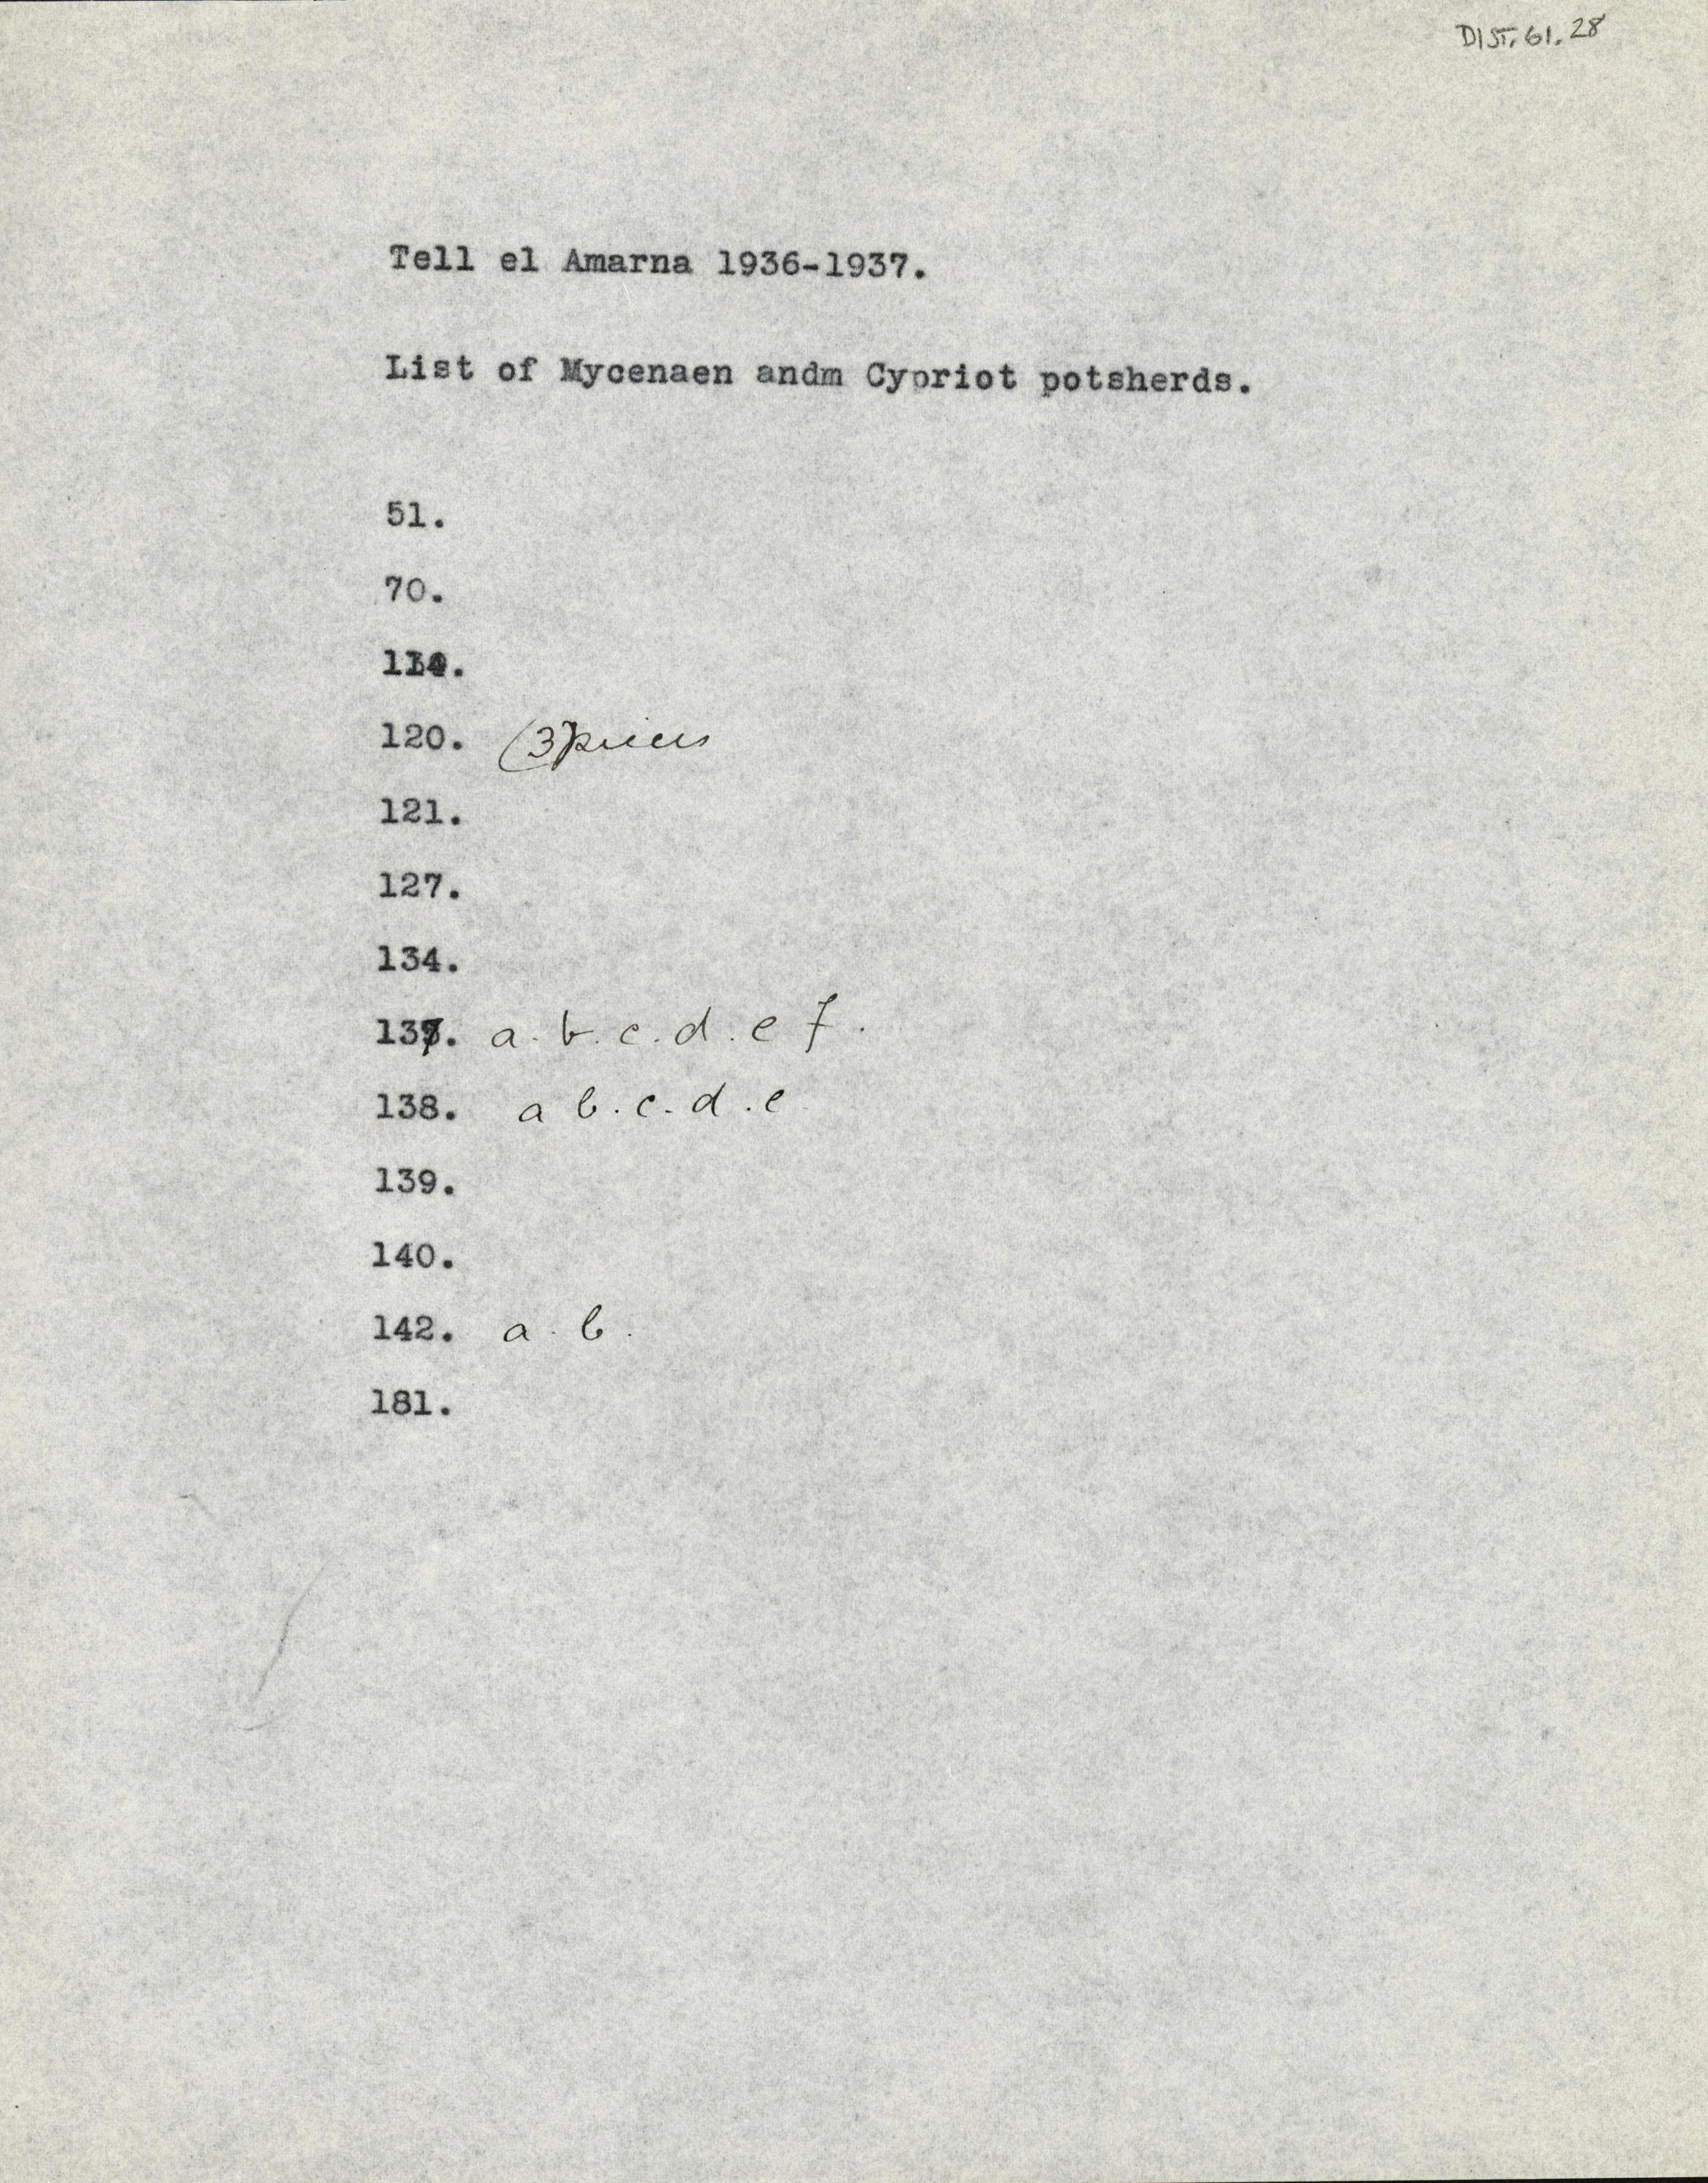 1936-37 el-Amarna DIST.61.28